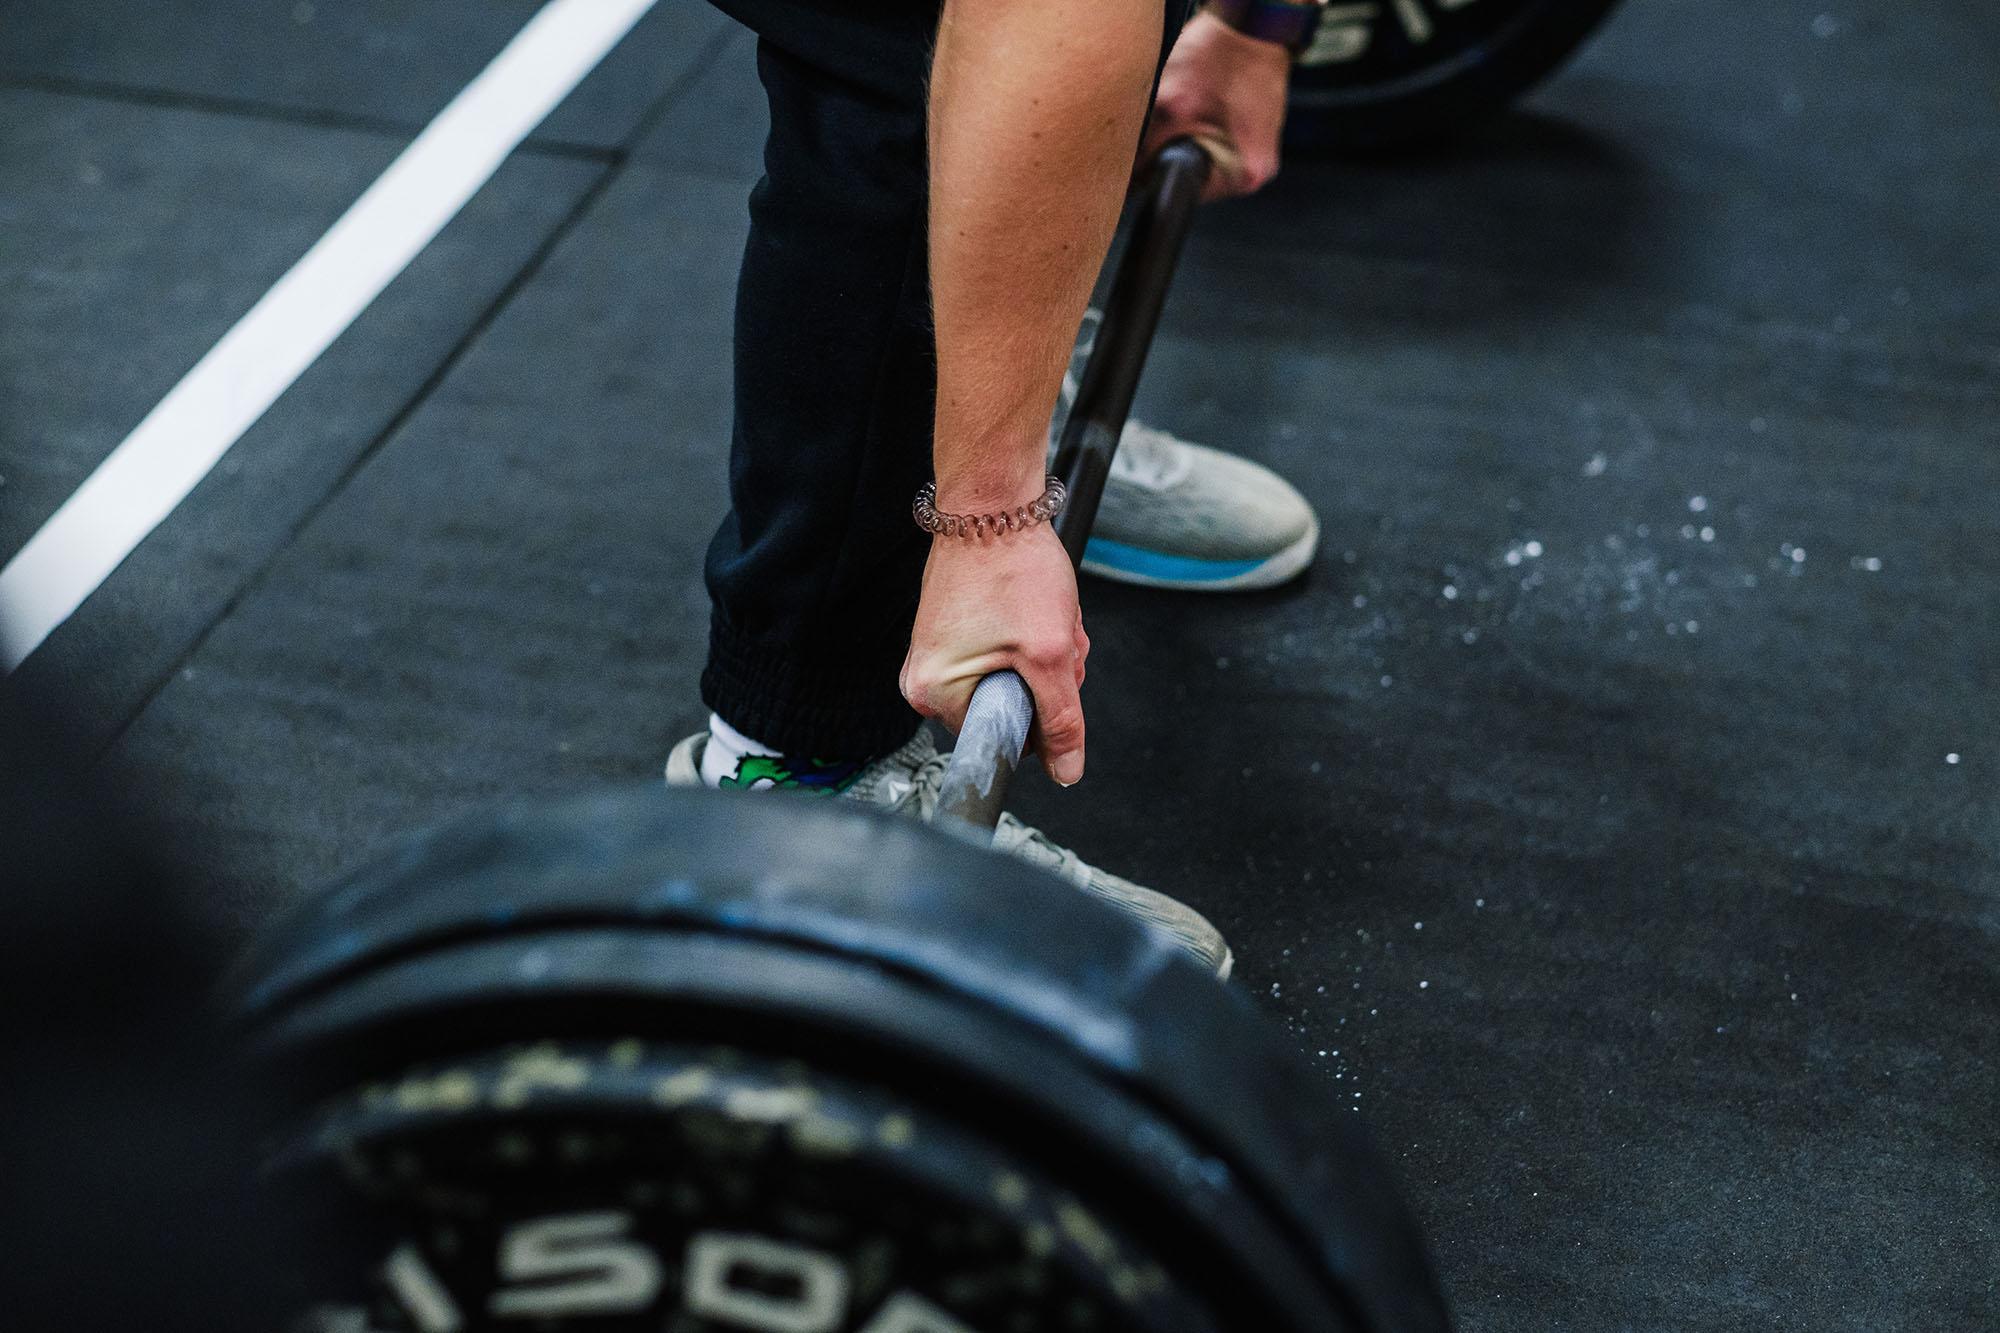 deadlift crossfit heavy weight